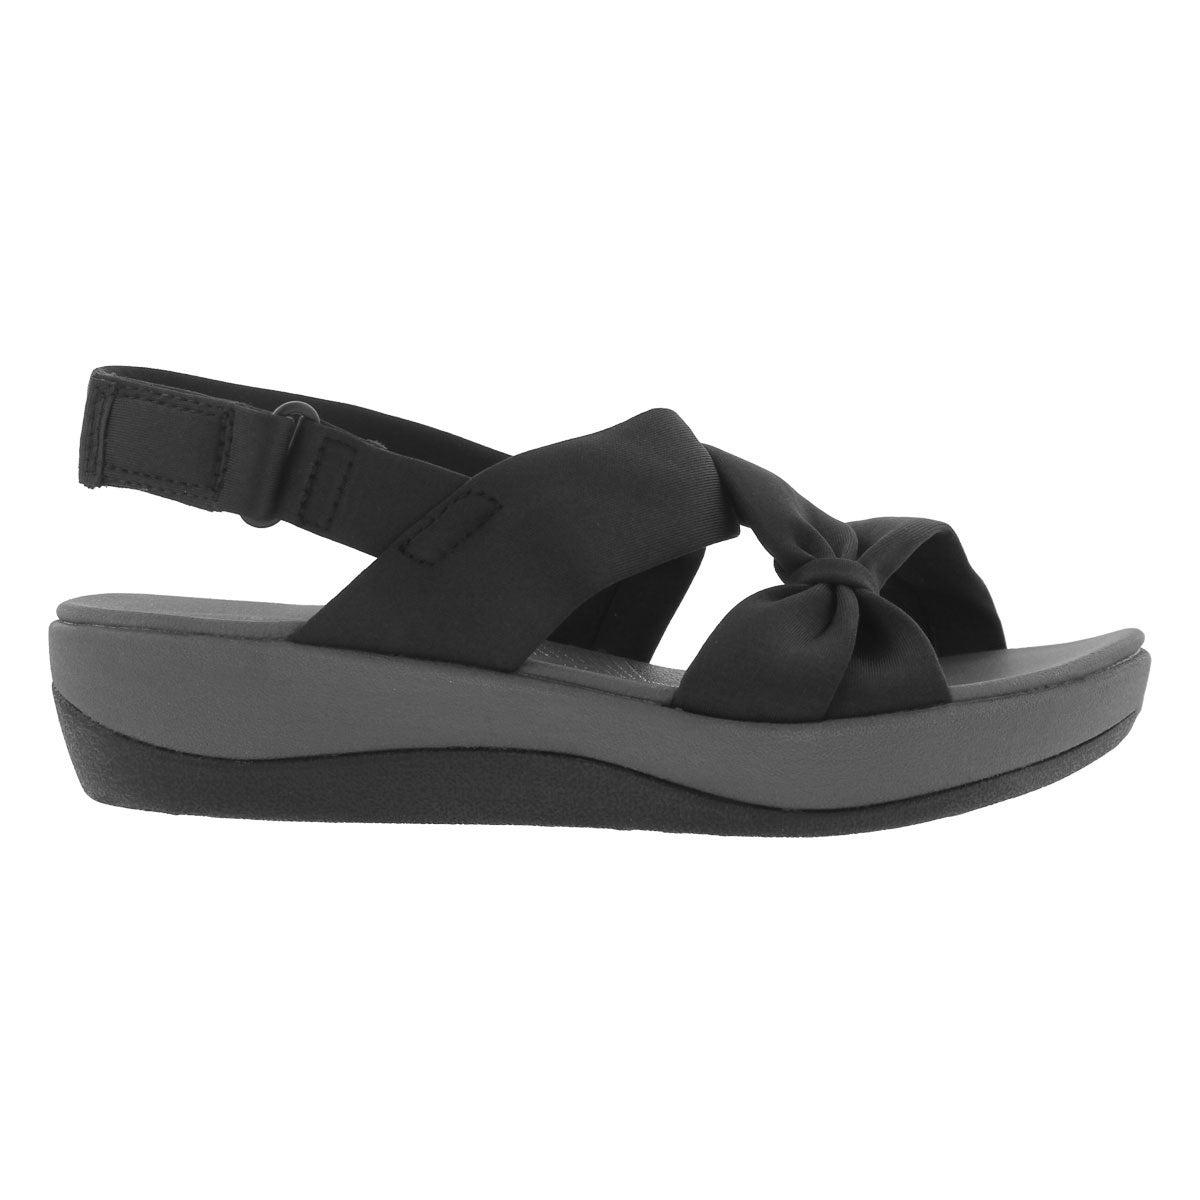 Lds Arla Primrose black wedge sandal